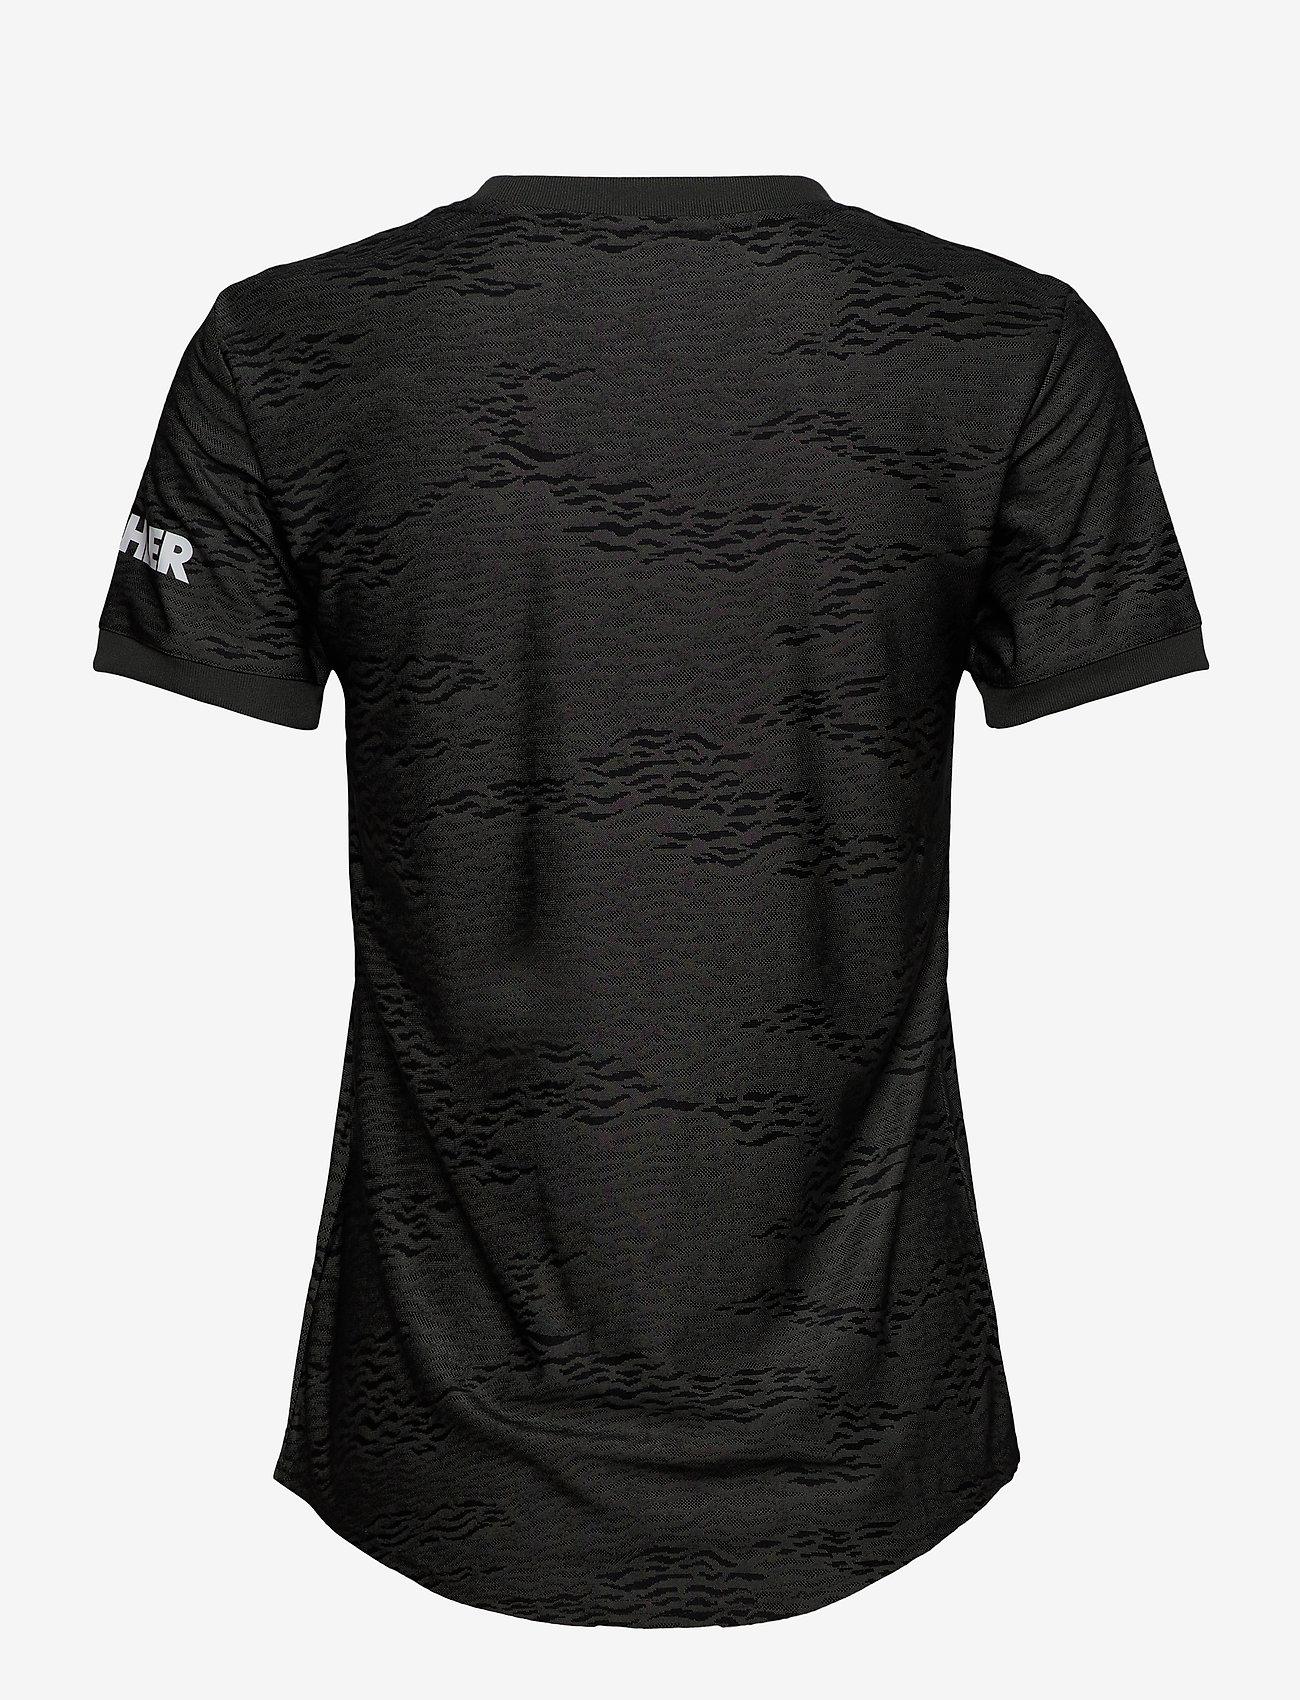 adidas Performance - MUFC A JSY W - football shirts - leggrn/black - 1